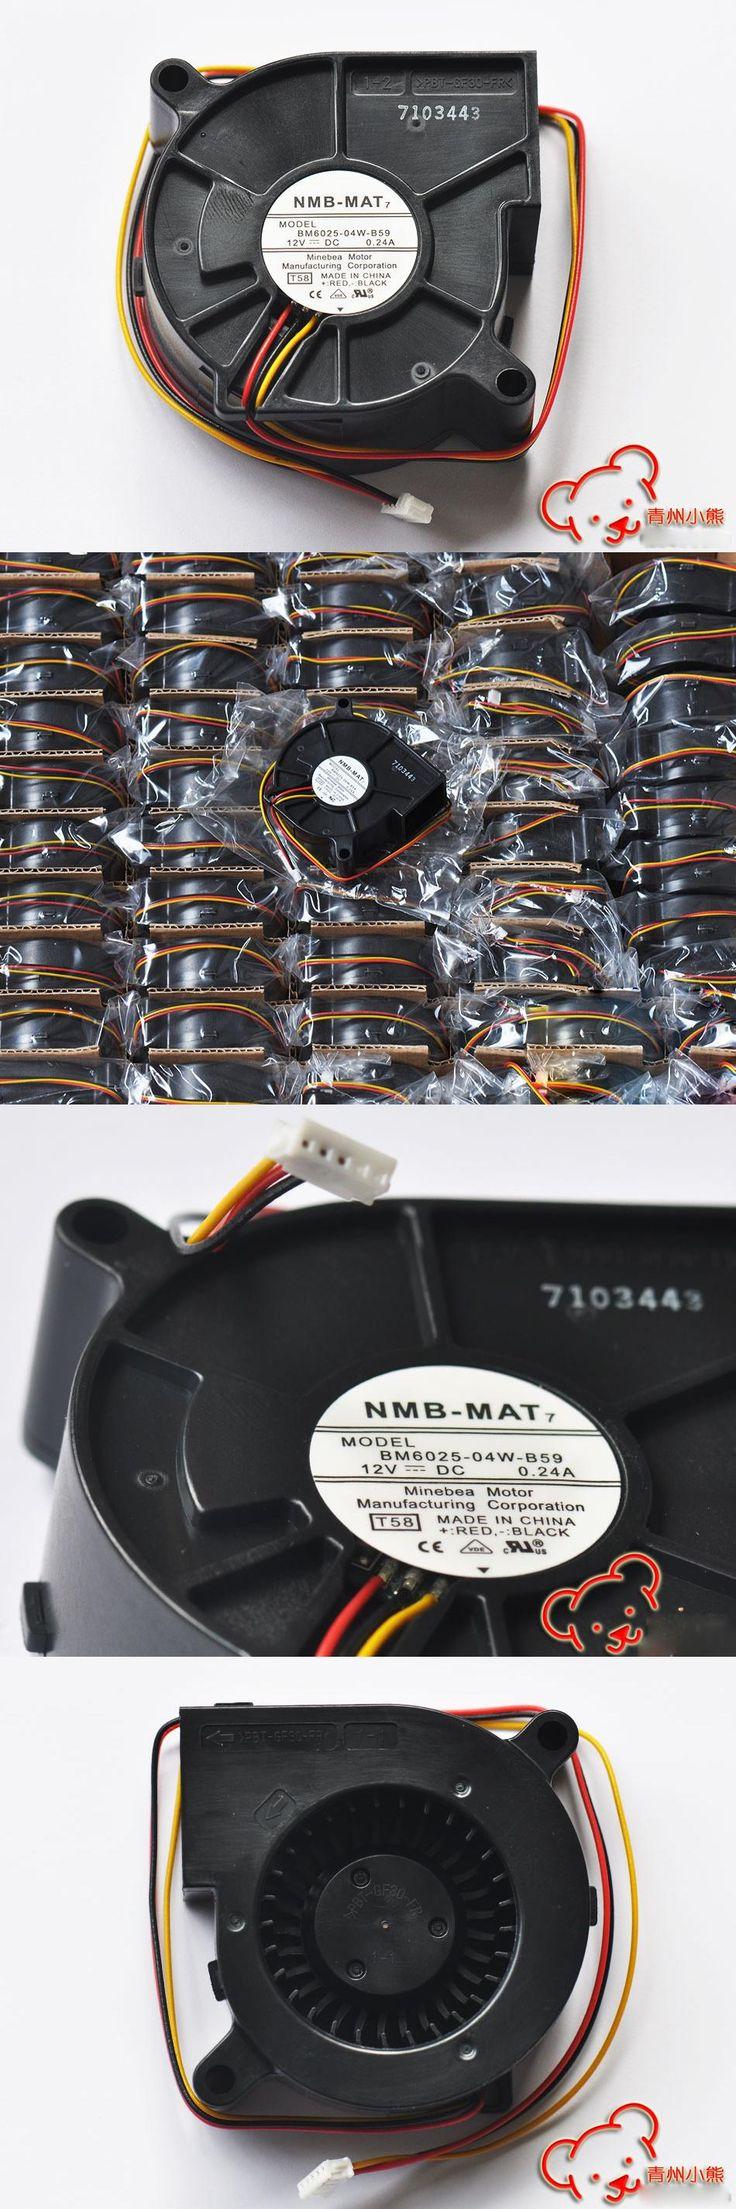 New Original NMB BM6025-04W-B59 6025 12V 0.24A turbine centrifugal fan blower fan